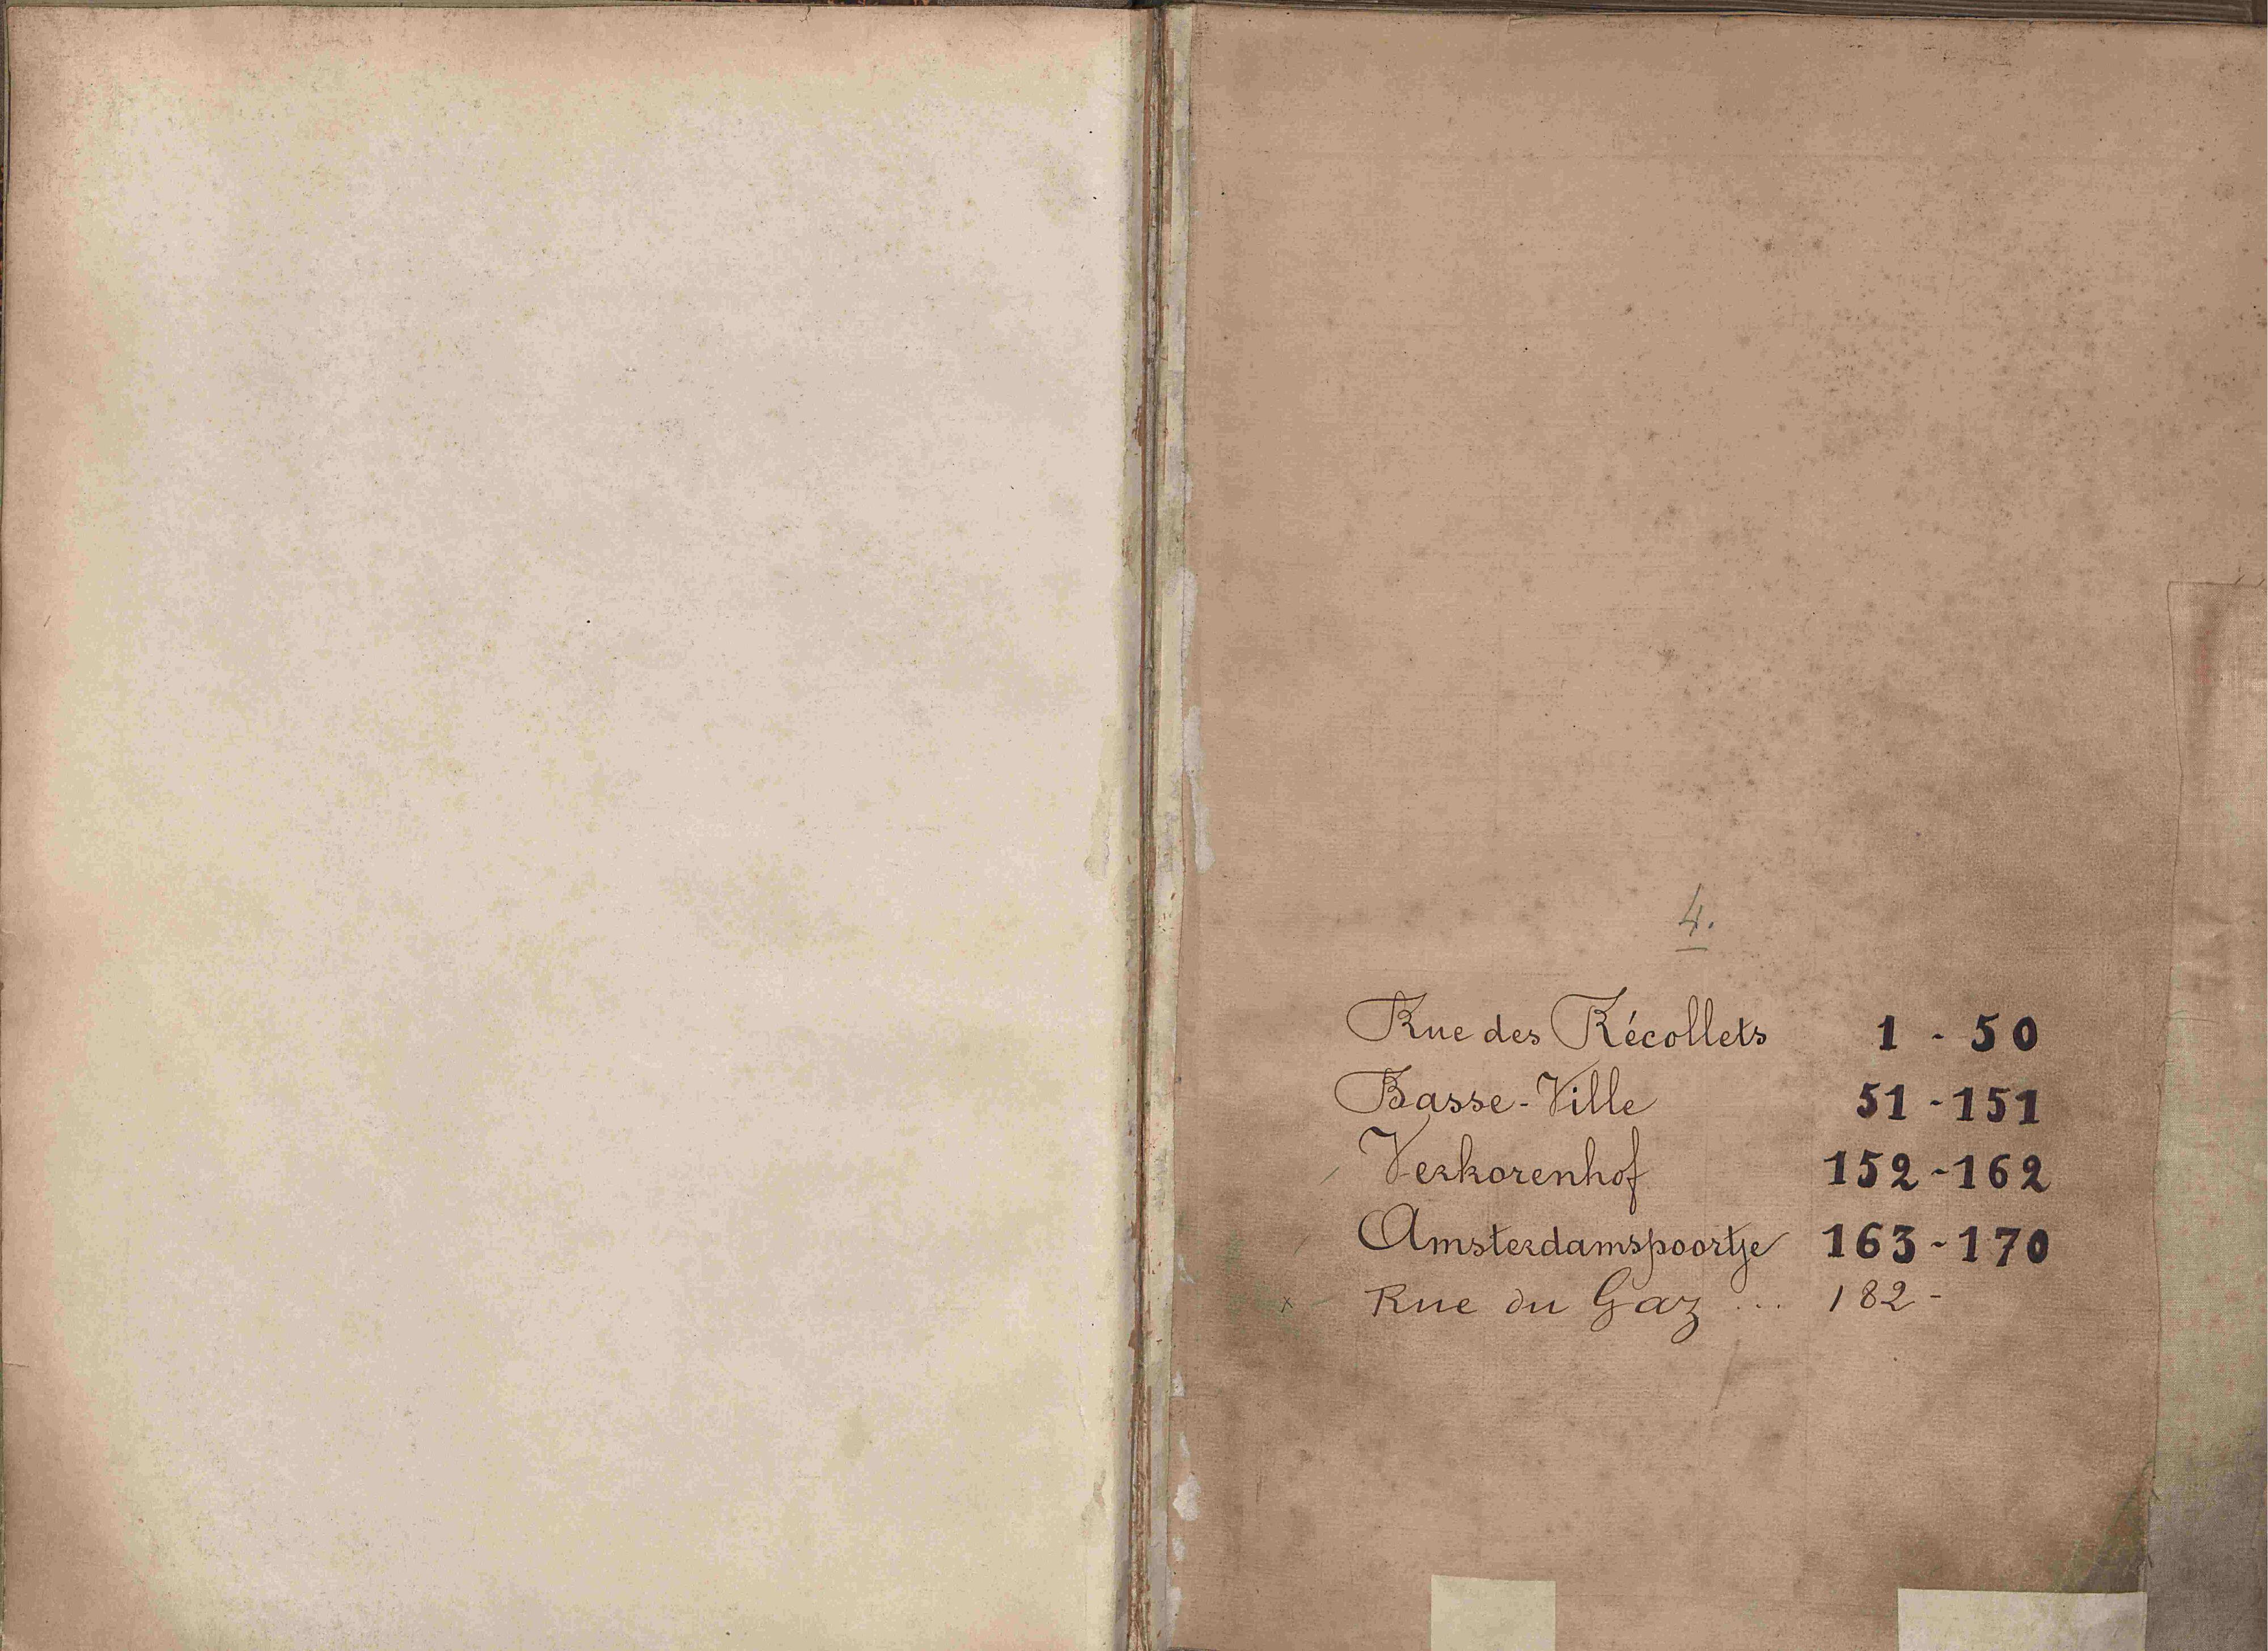 Bevolkingsregister Kortrijk 1890 boek 4